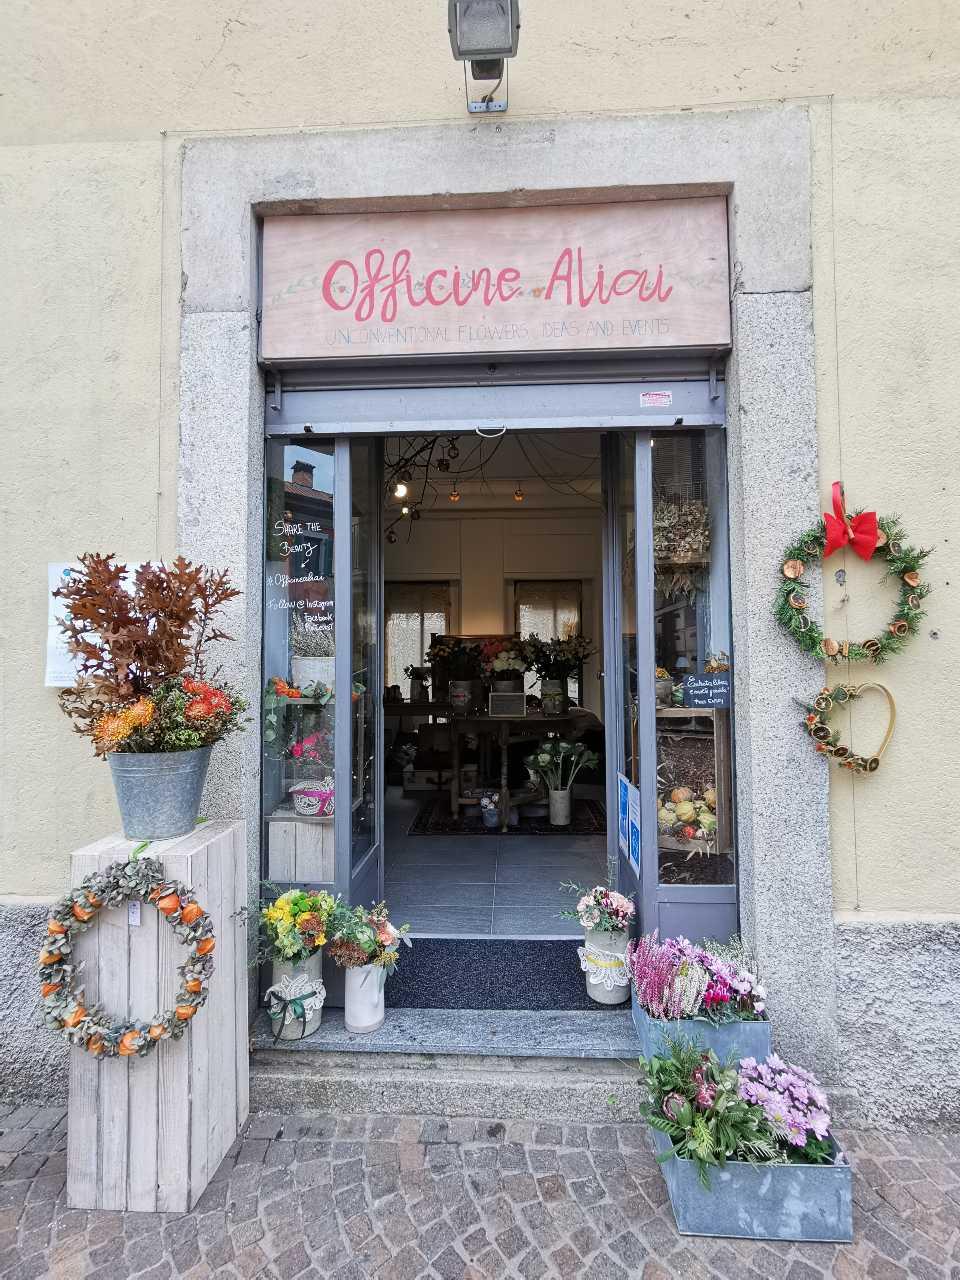 Concept store Officine Aliai